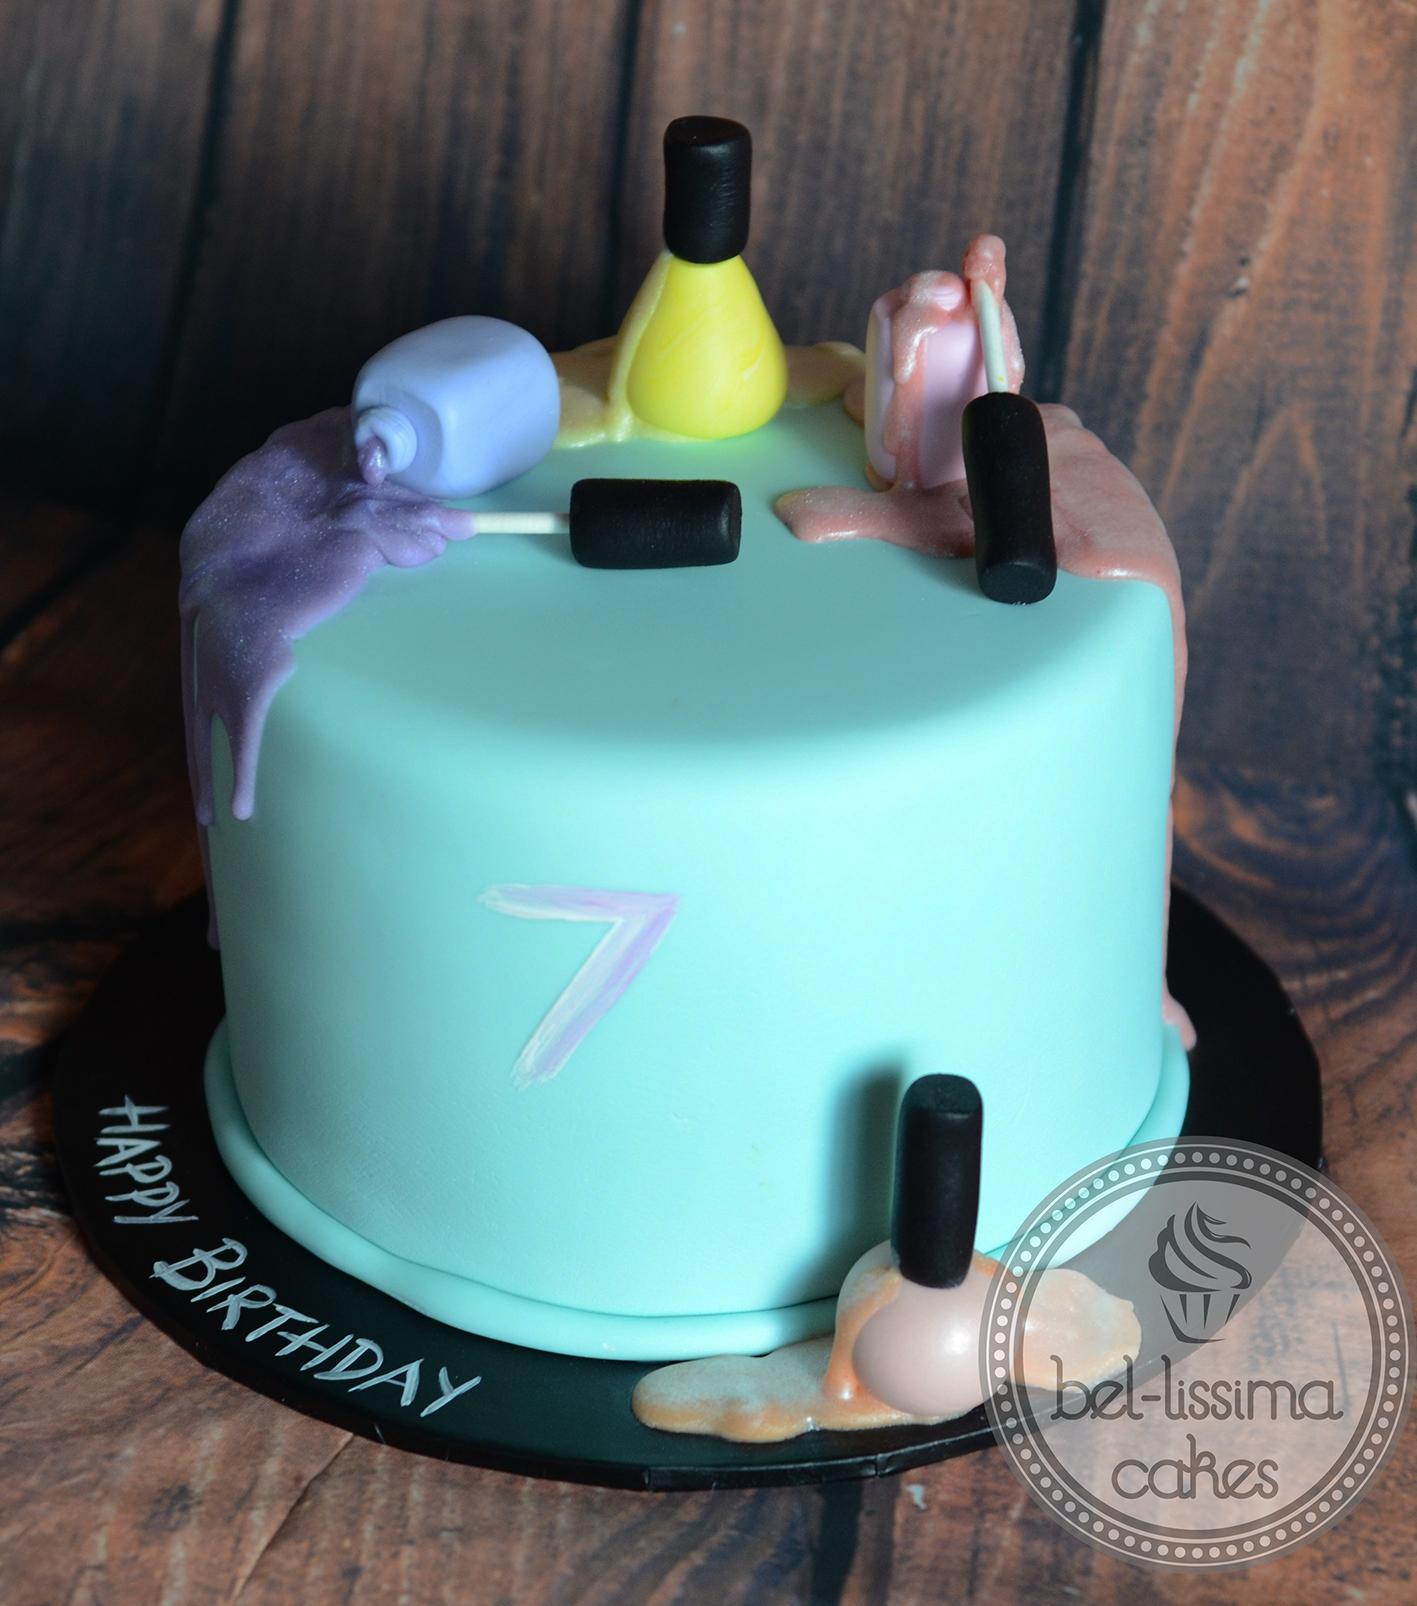 Nail Cakes Bakery: Bel-lissima Cakes